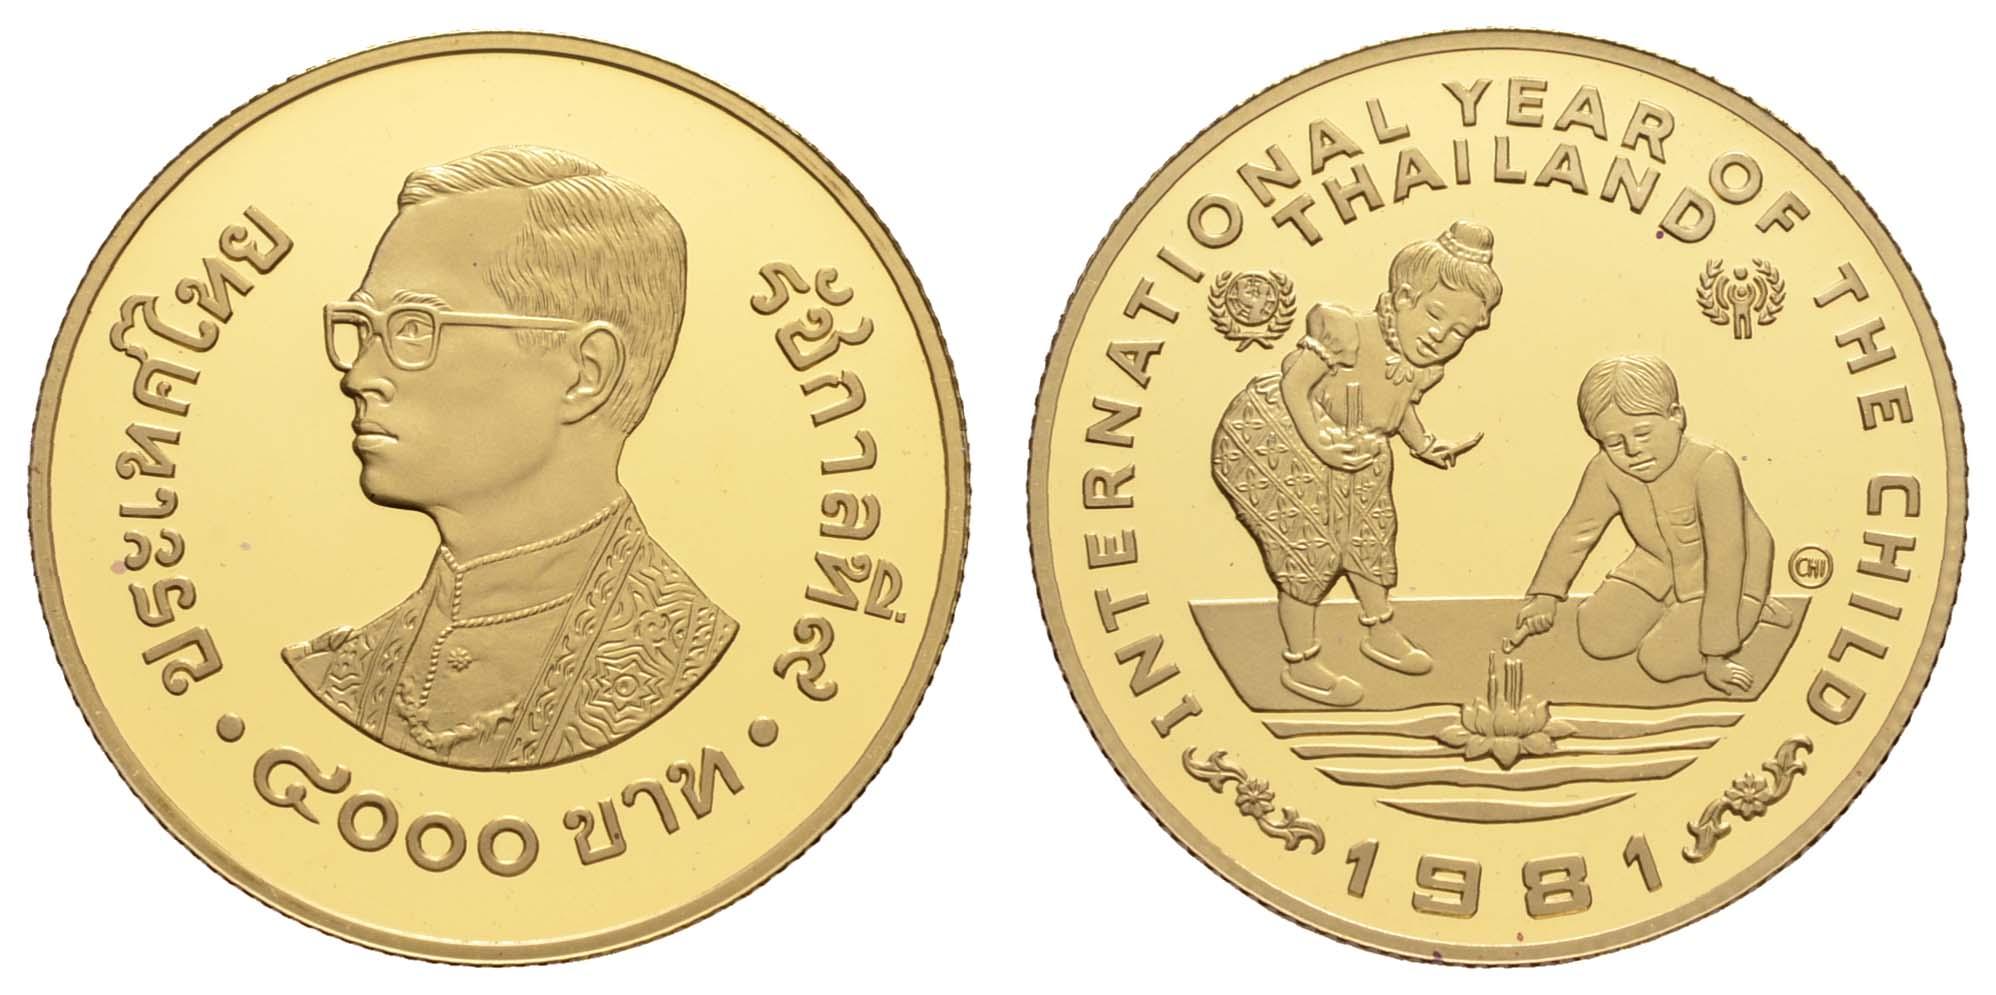 Lot 2134 - übersee thailand -  Auktionshaus Ulrich Felzmann GmbH & Co. KG Coins single lots